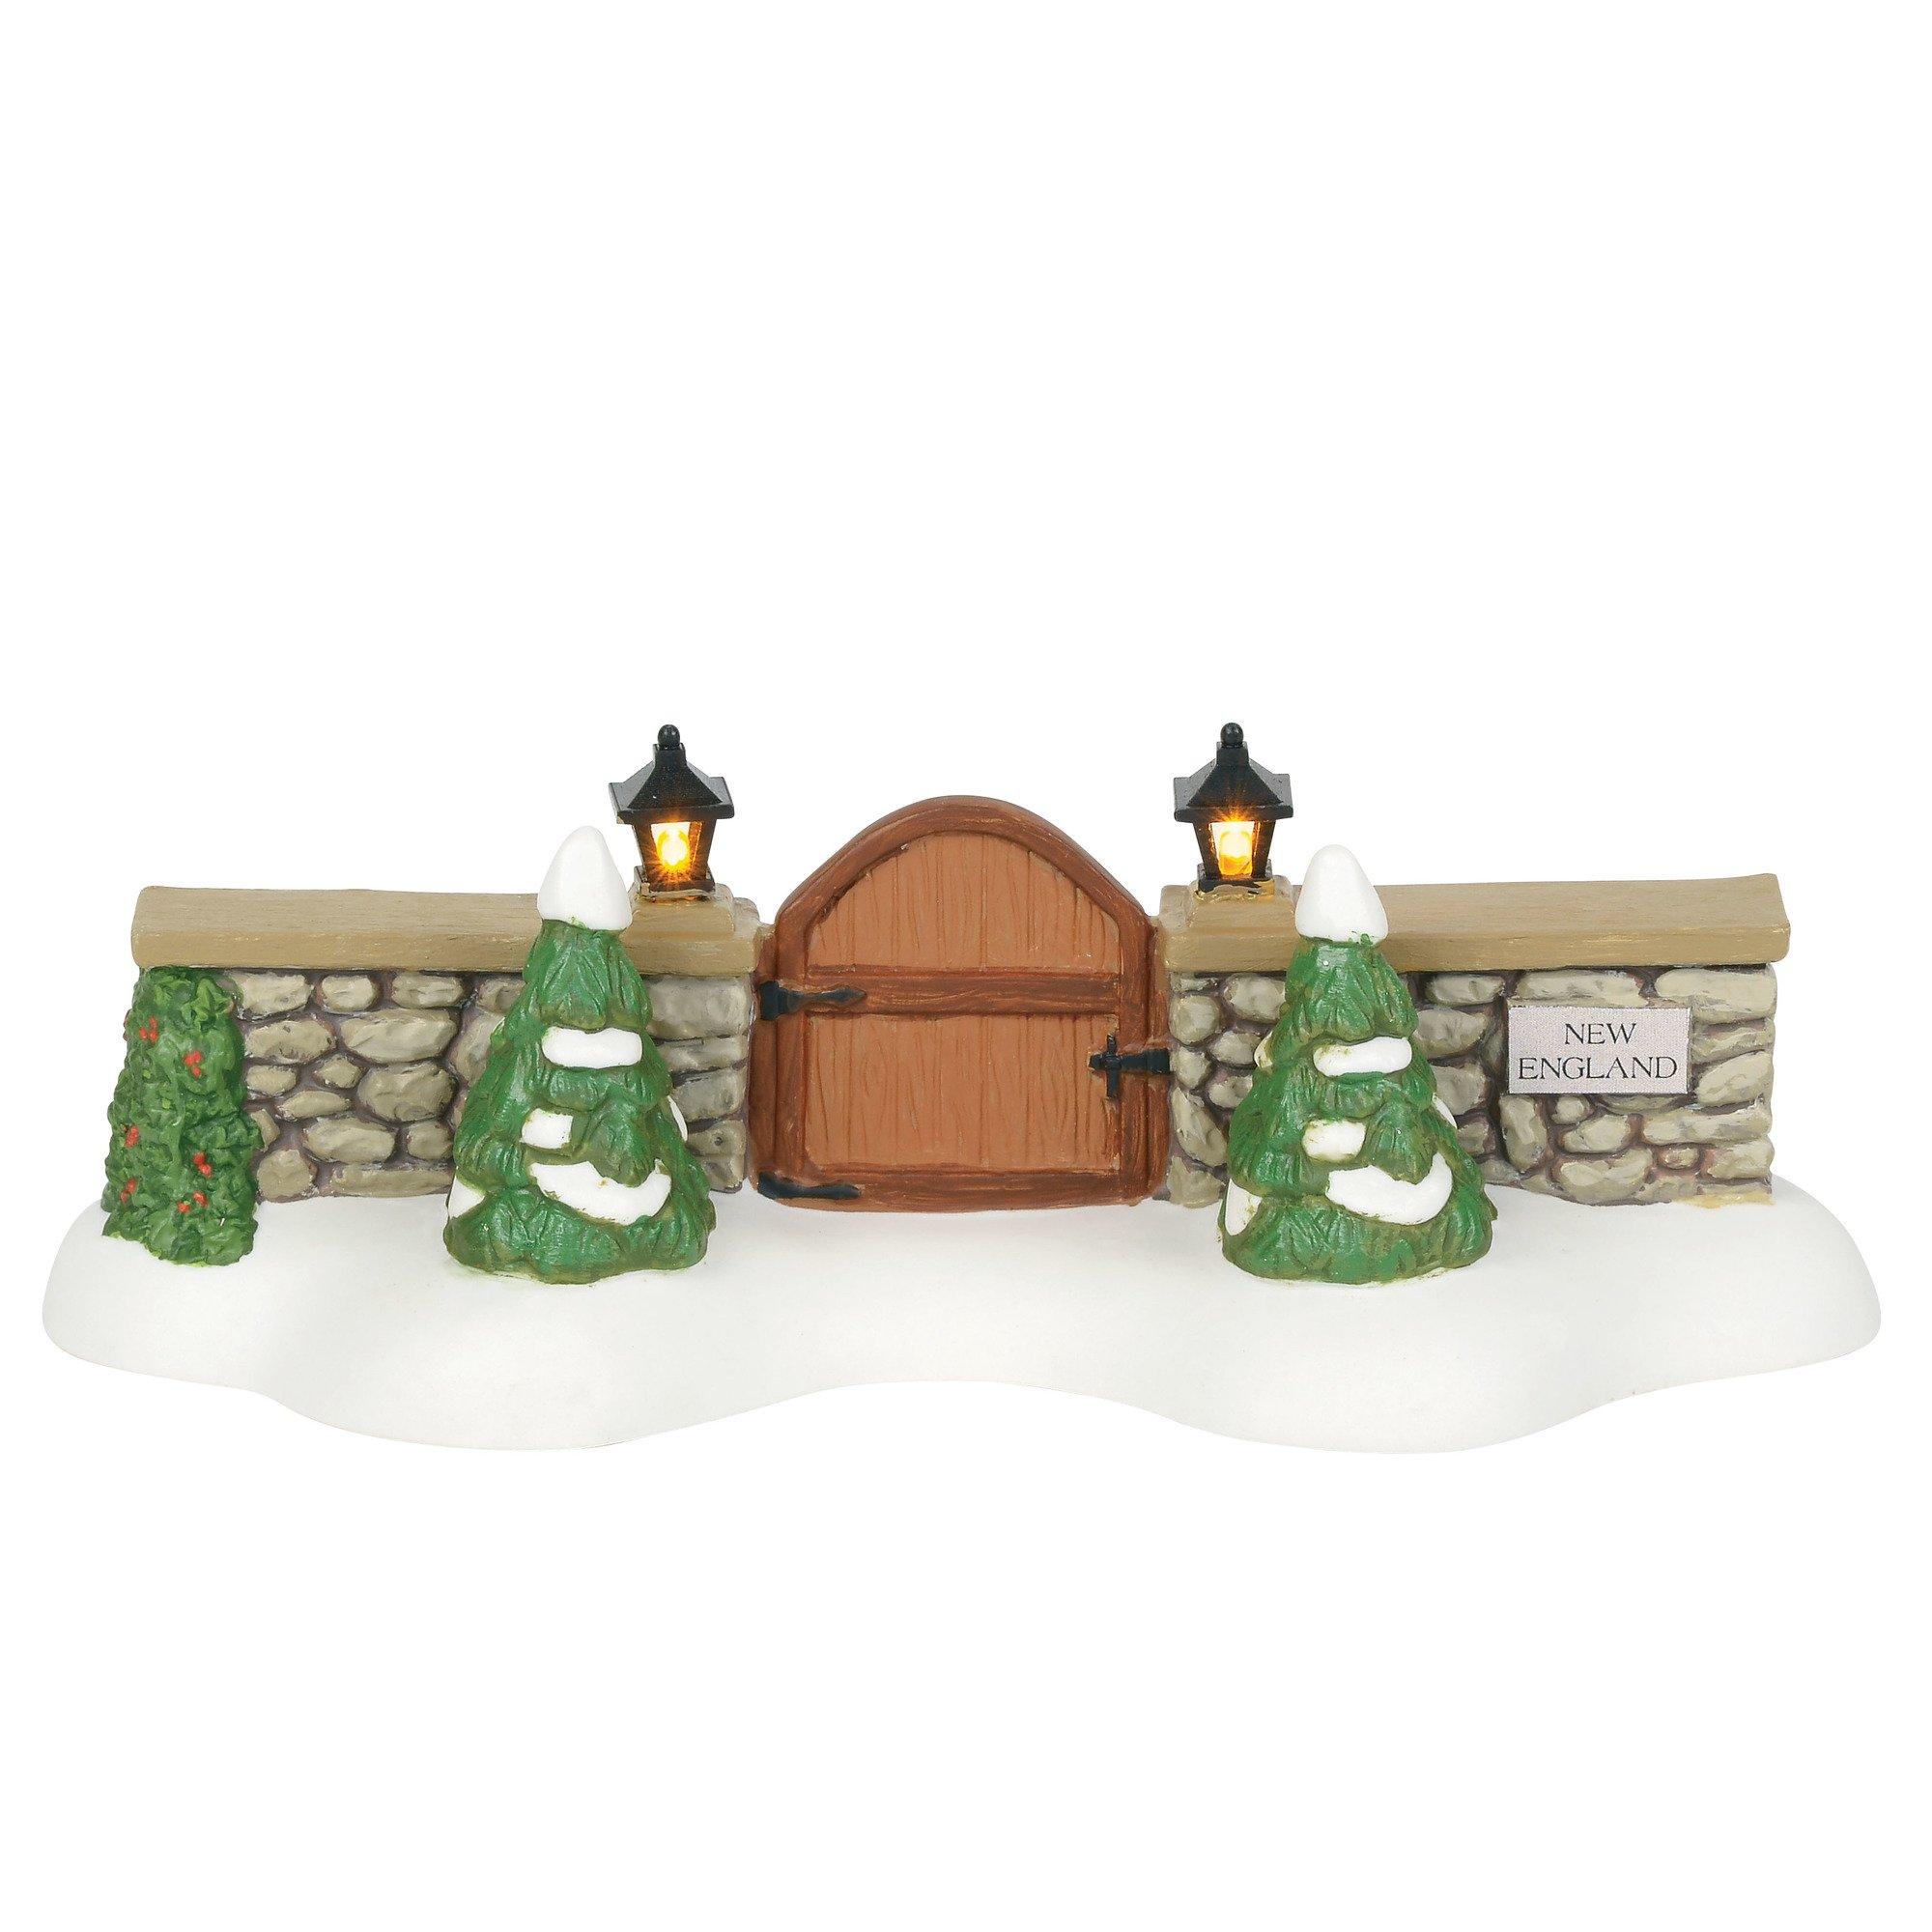 Department 56 New England Village Accessories Entry Gate Lit Figurine, 1.75'', Multicolor